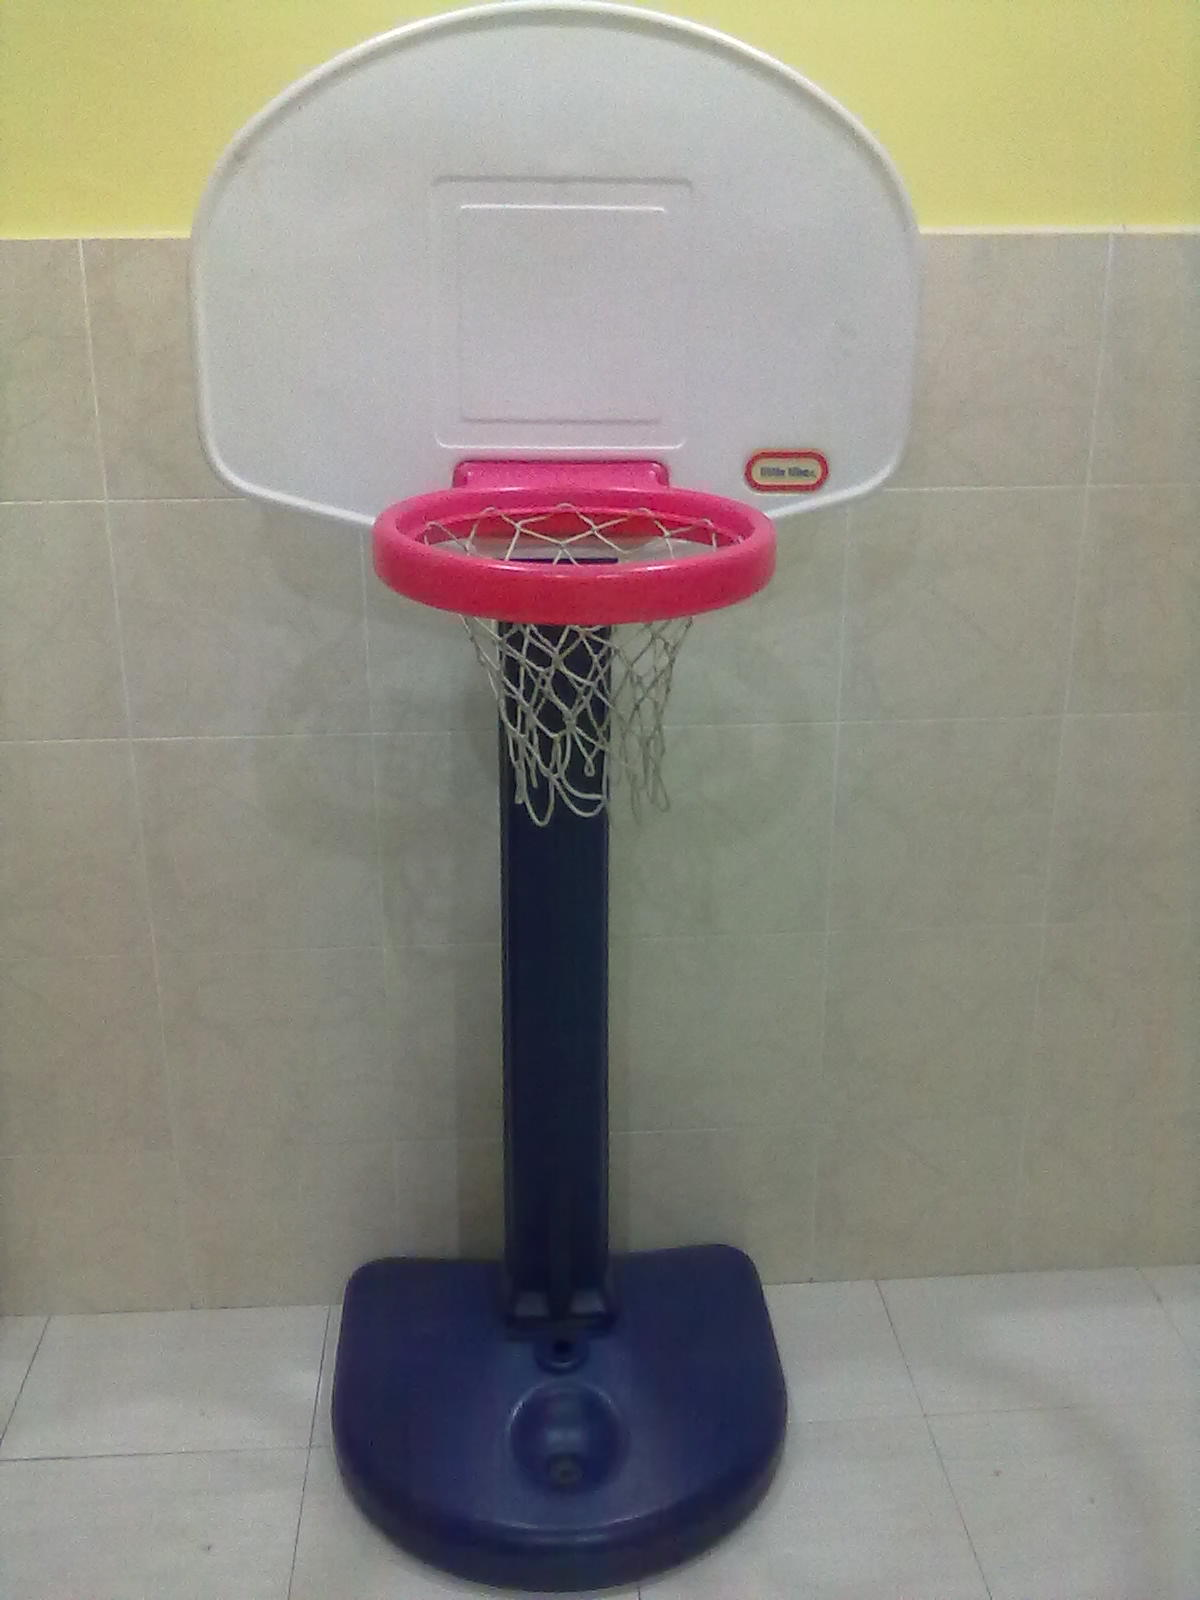 MyBundleToys: Little Tikes Basketball Hoop